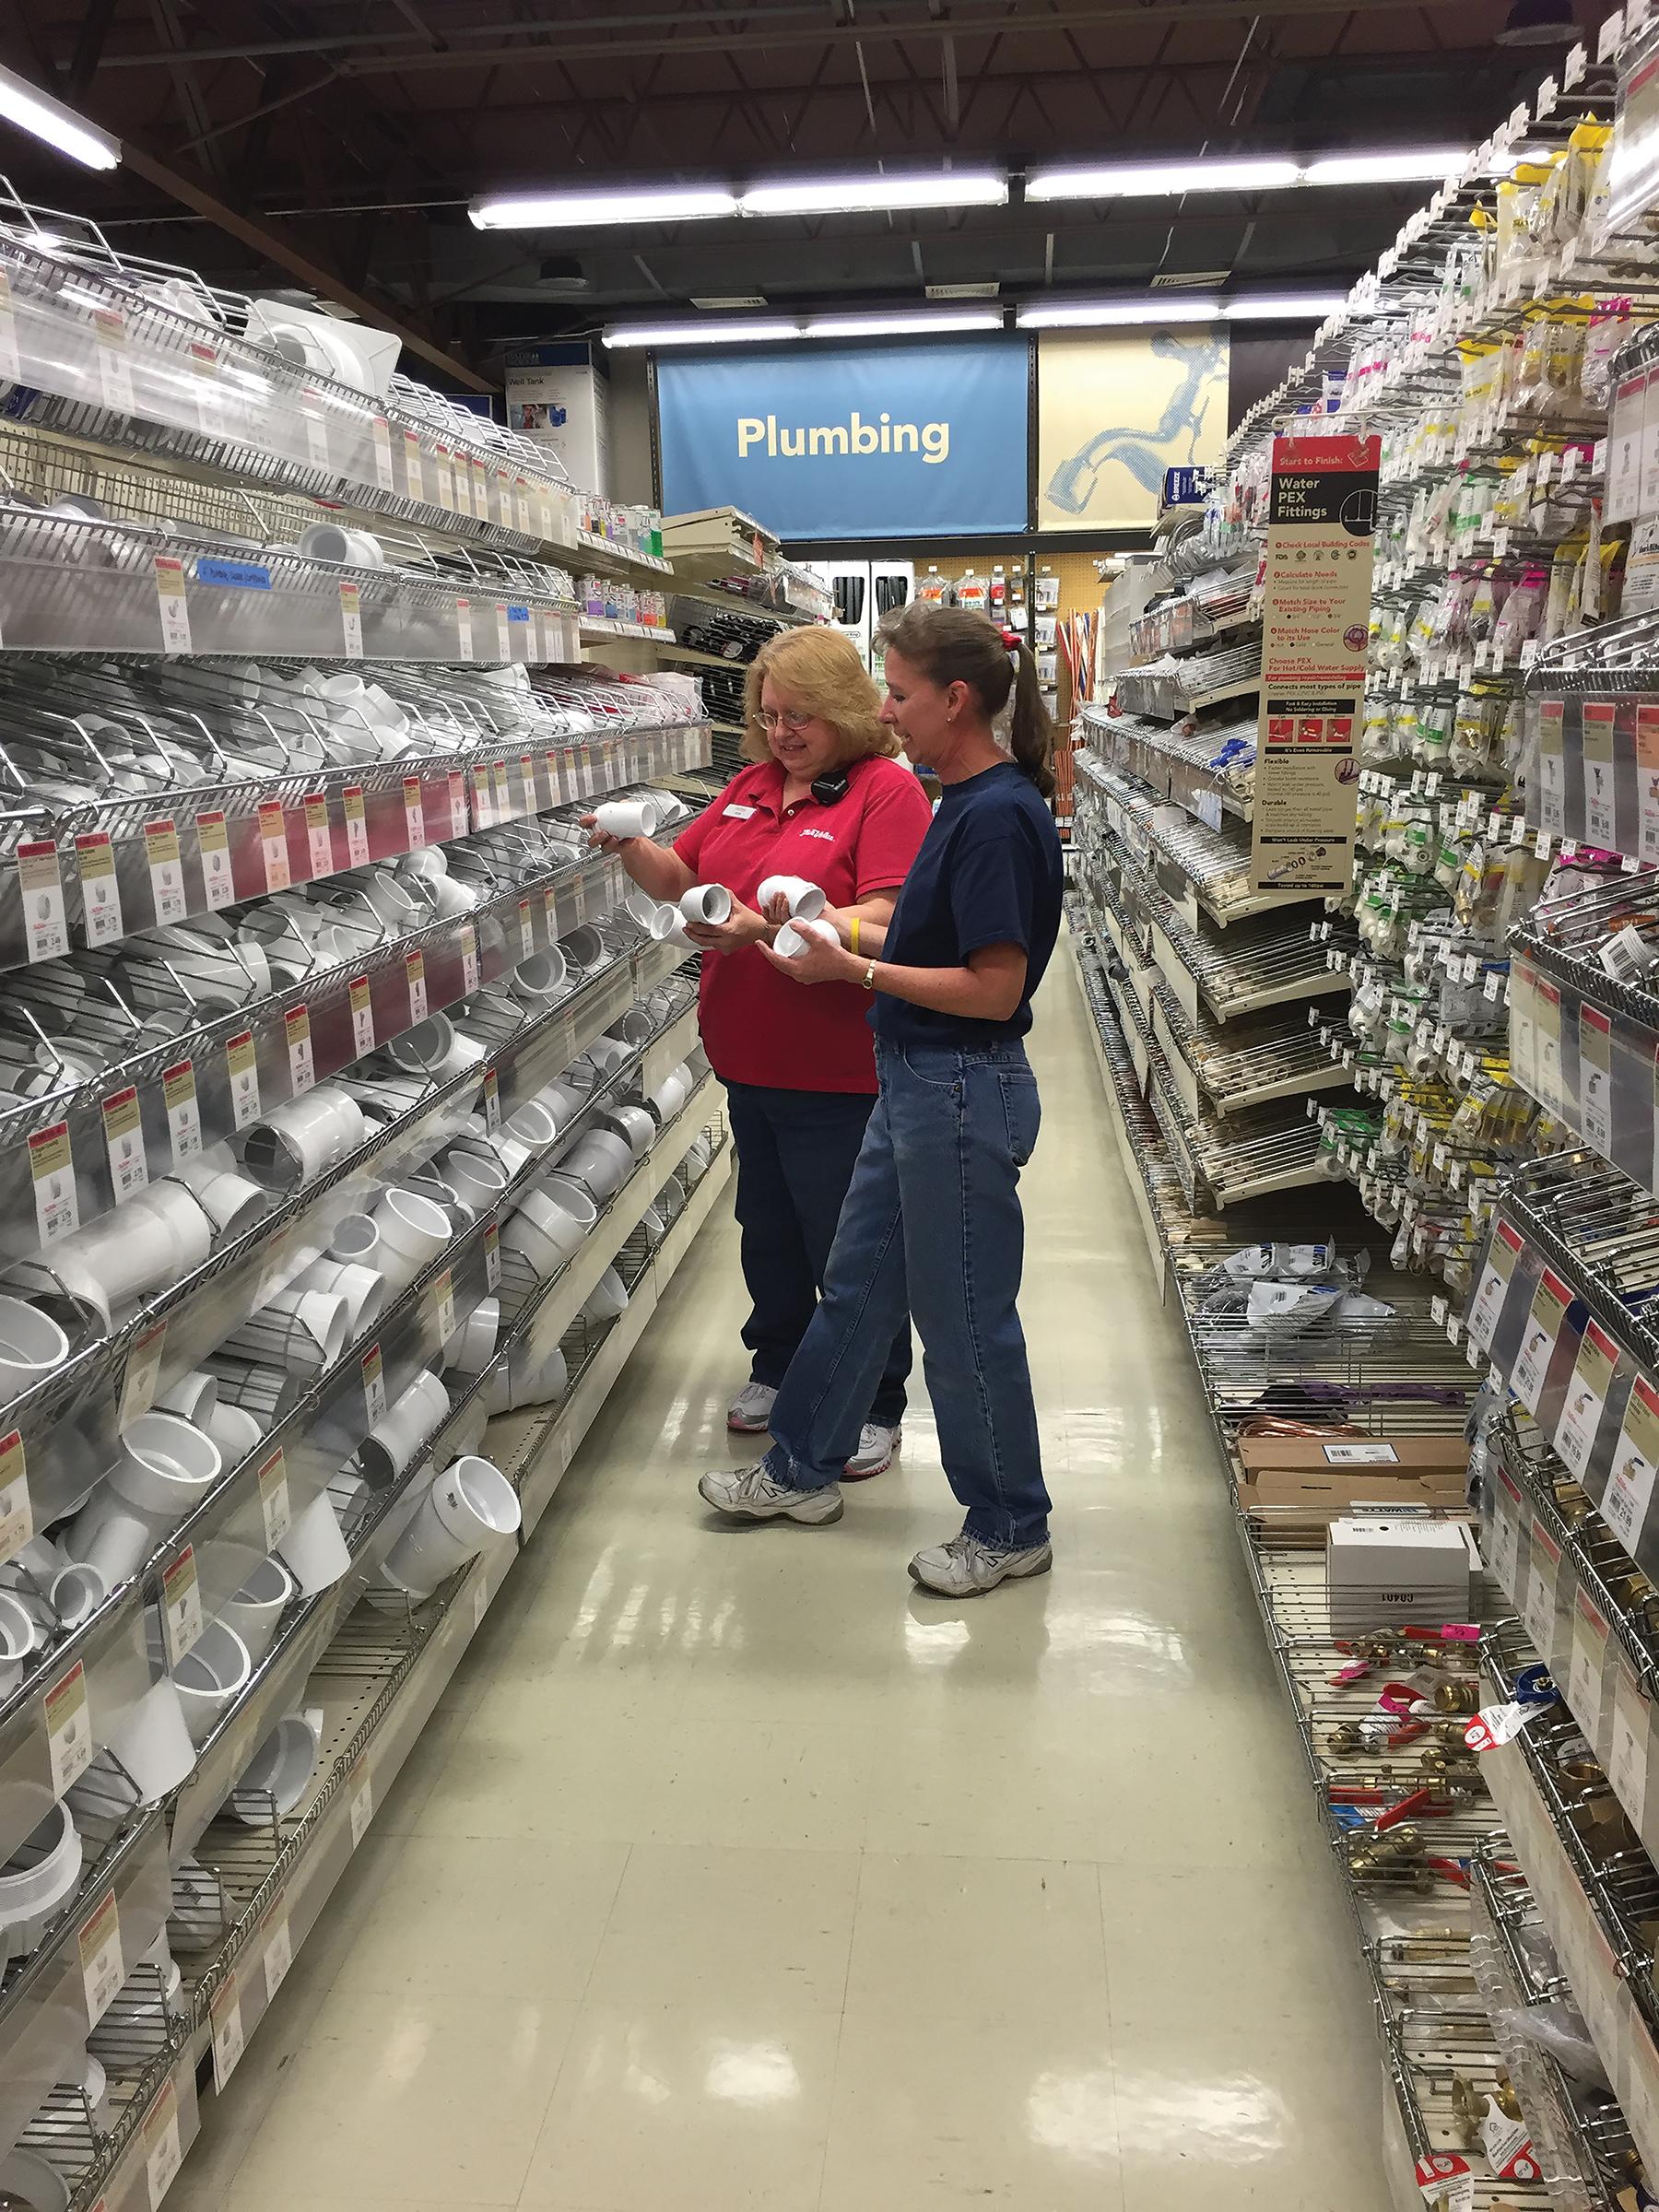 Five Tips for Better Serving the Pro Plumber Market   Hardware Retailing